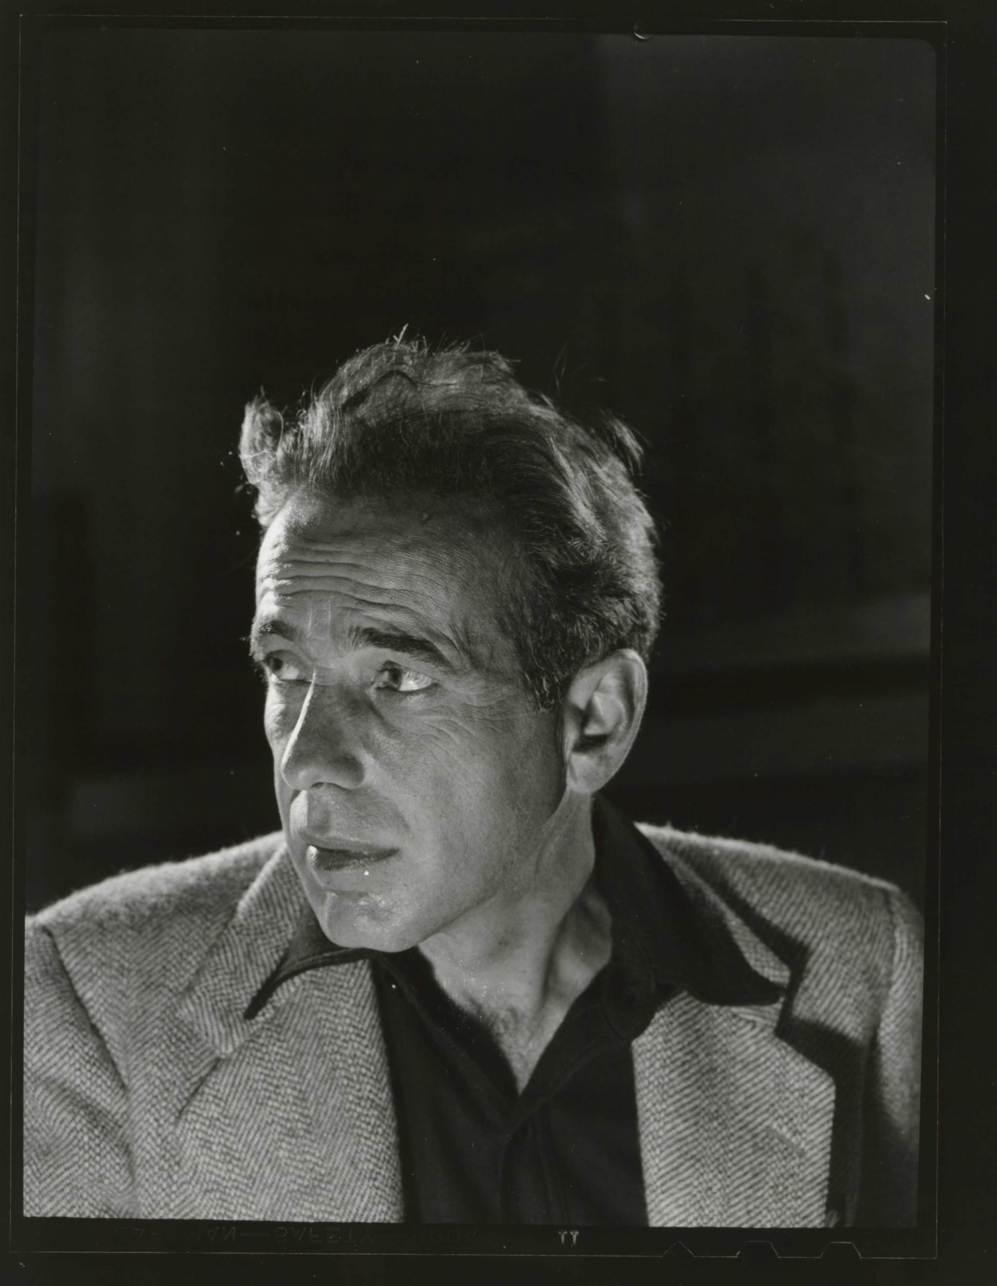 El actor Humpret Bogart, en 1944.